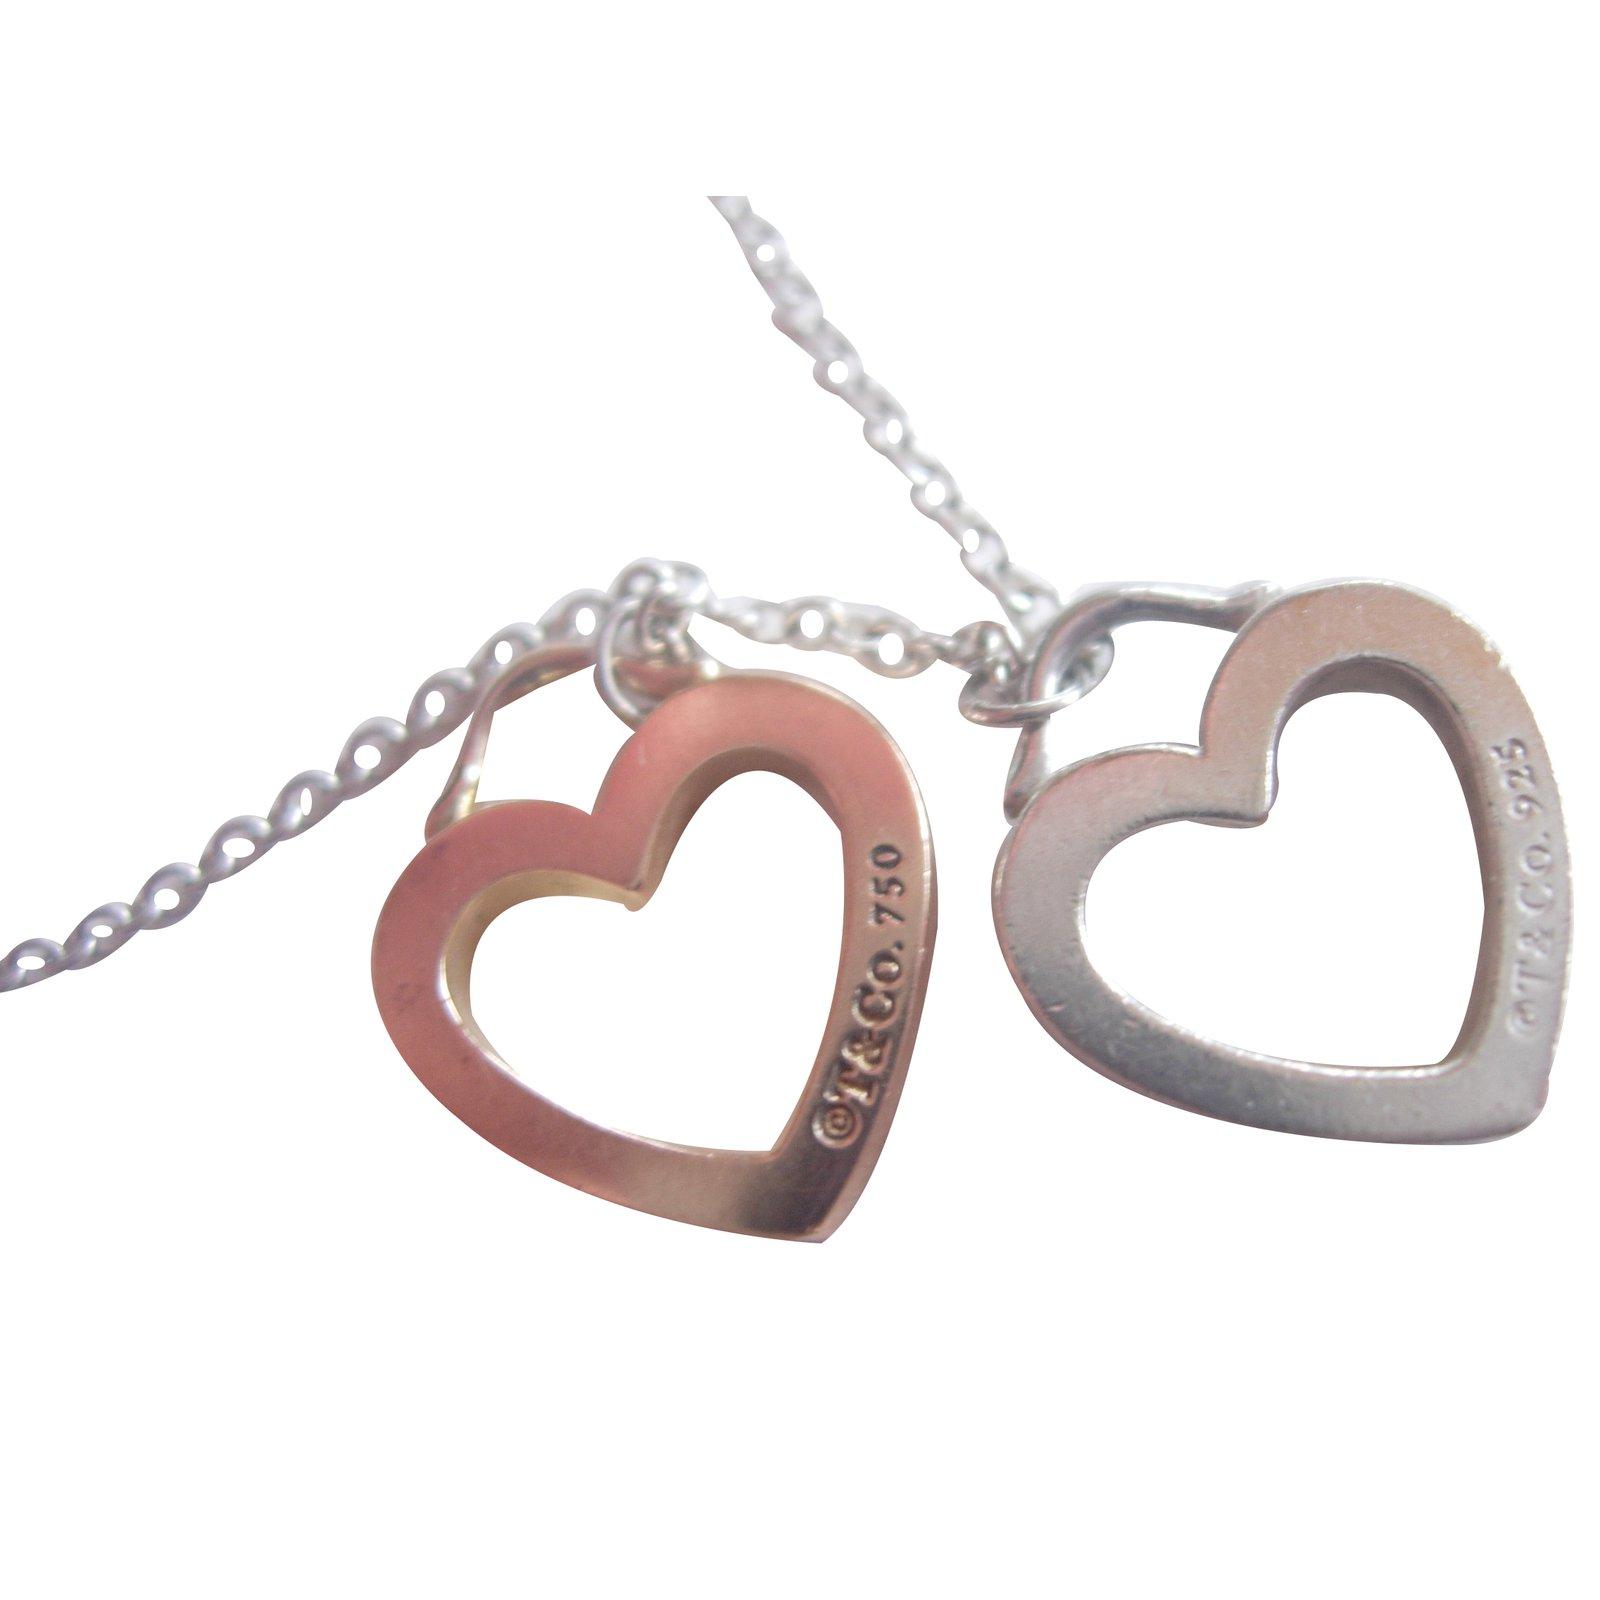 Tiffany co pendant necklace pendant necklaces silveryellow gold tiffany co pendant necklace pendant necklaces silveryellow gold silverygolden ref aloadofball Gallery